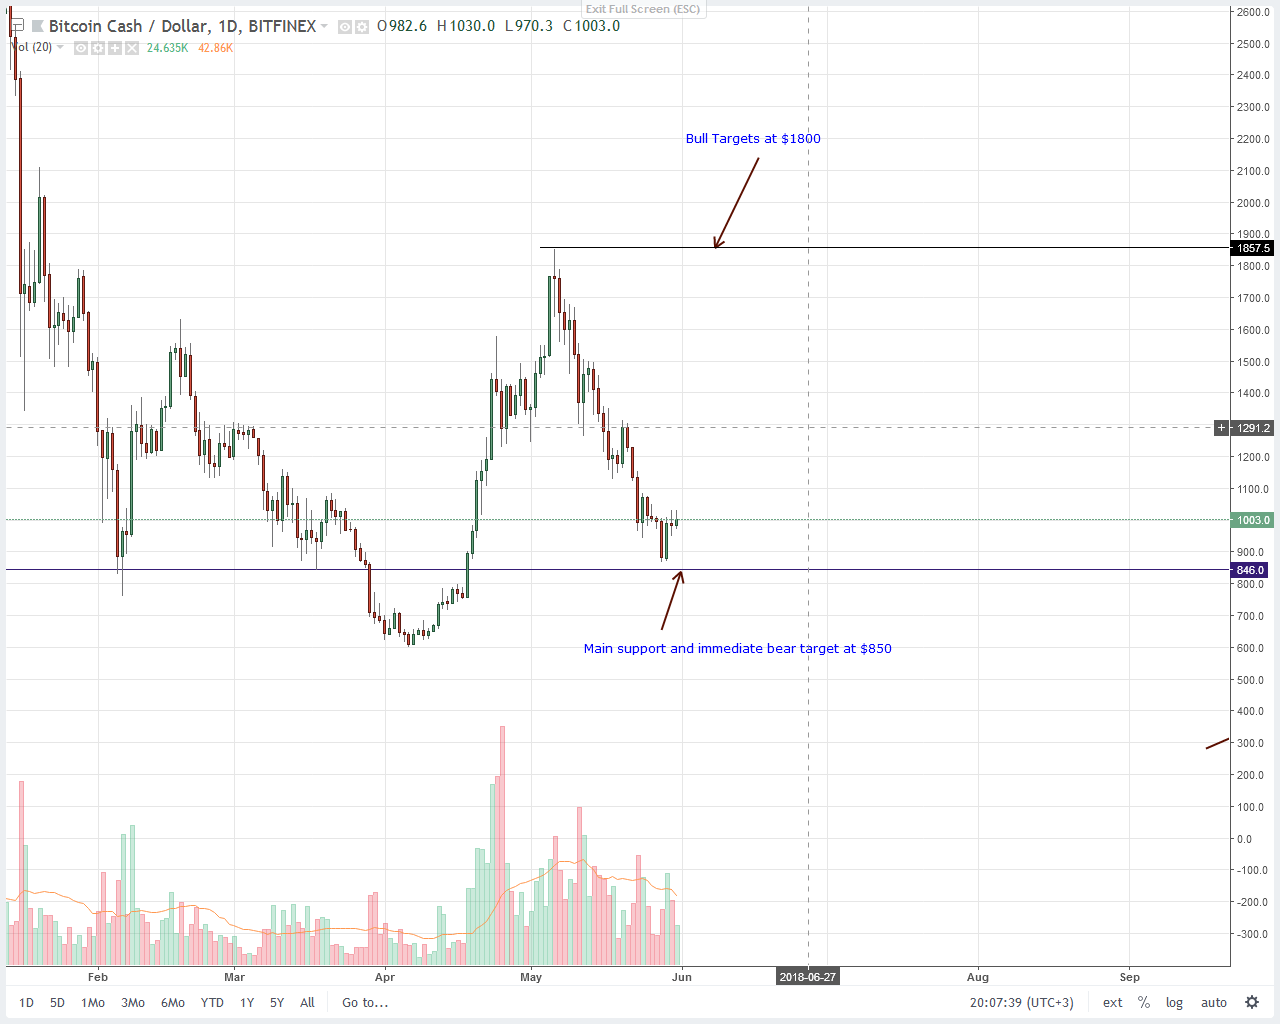 Bitcoin Cash (BCH) Price Technical Analysis